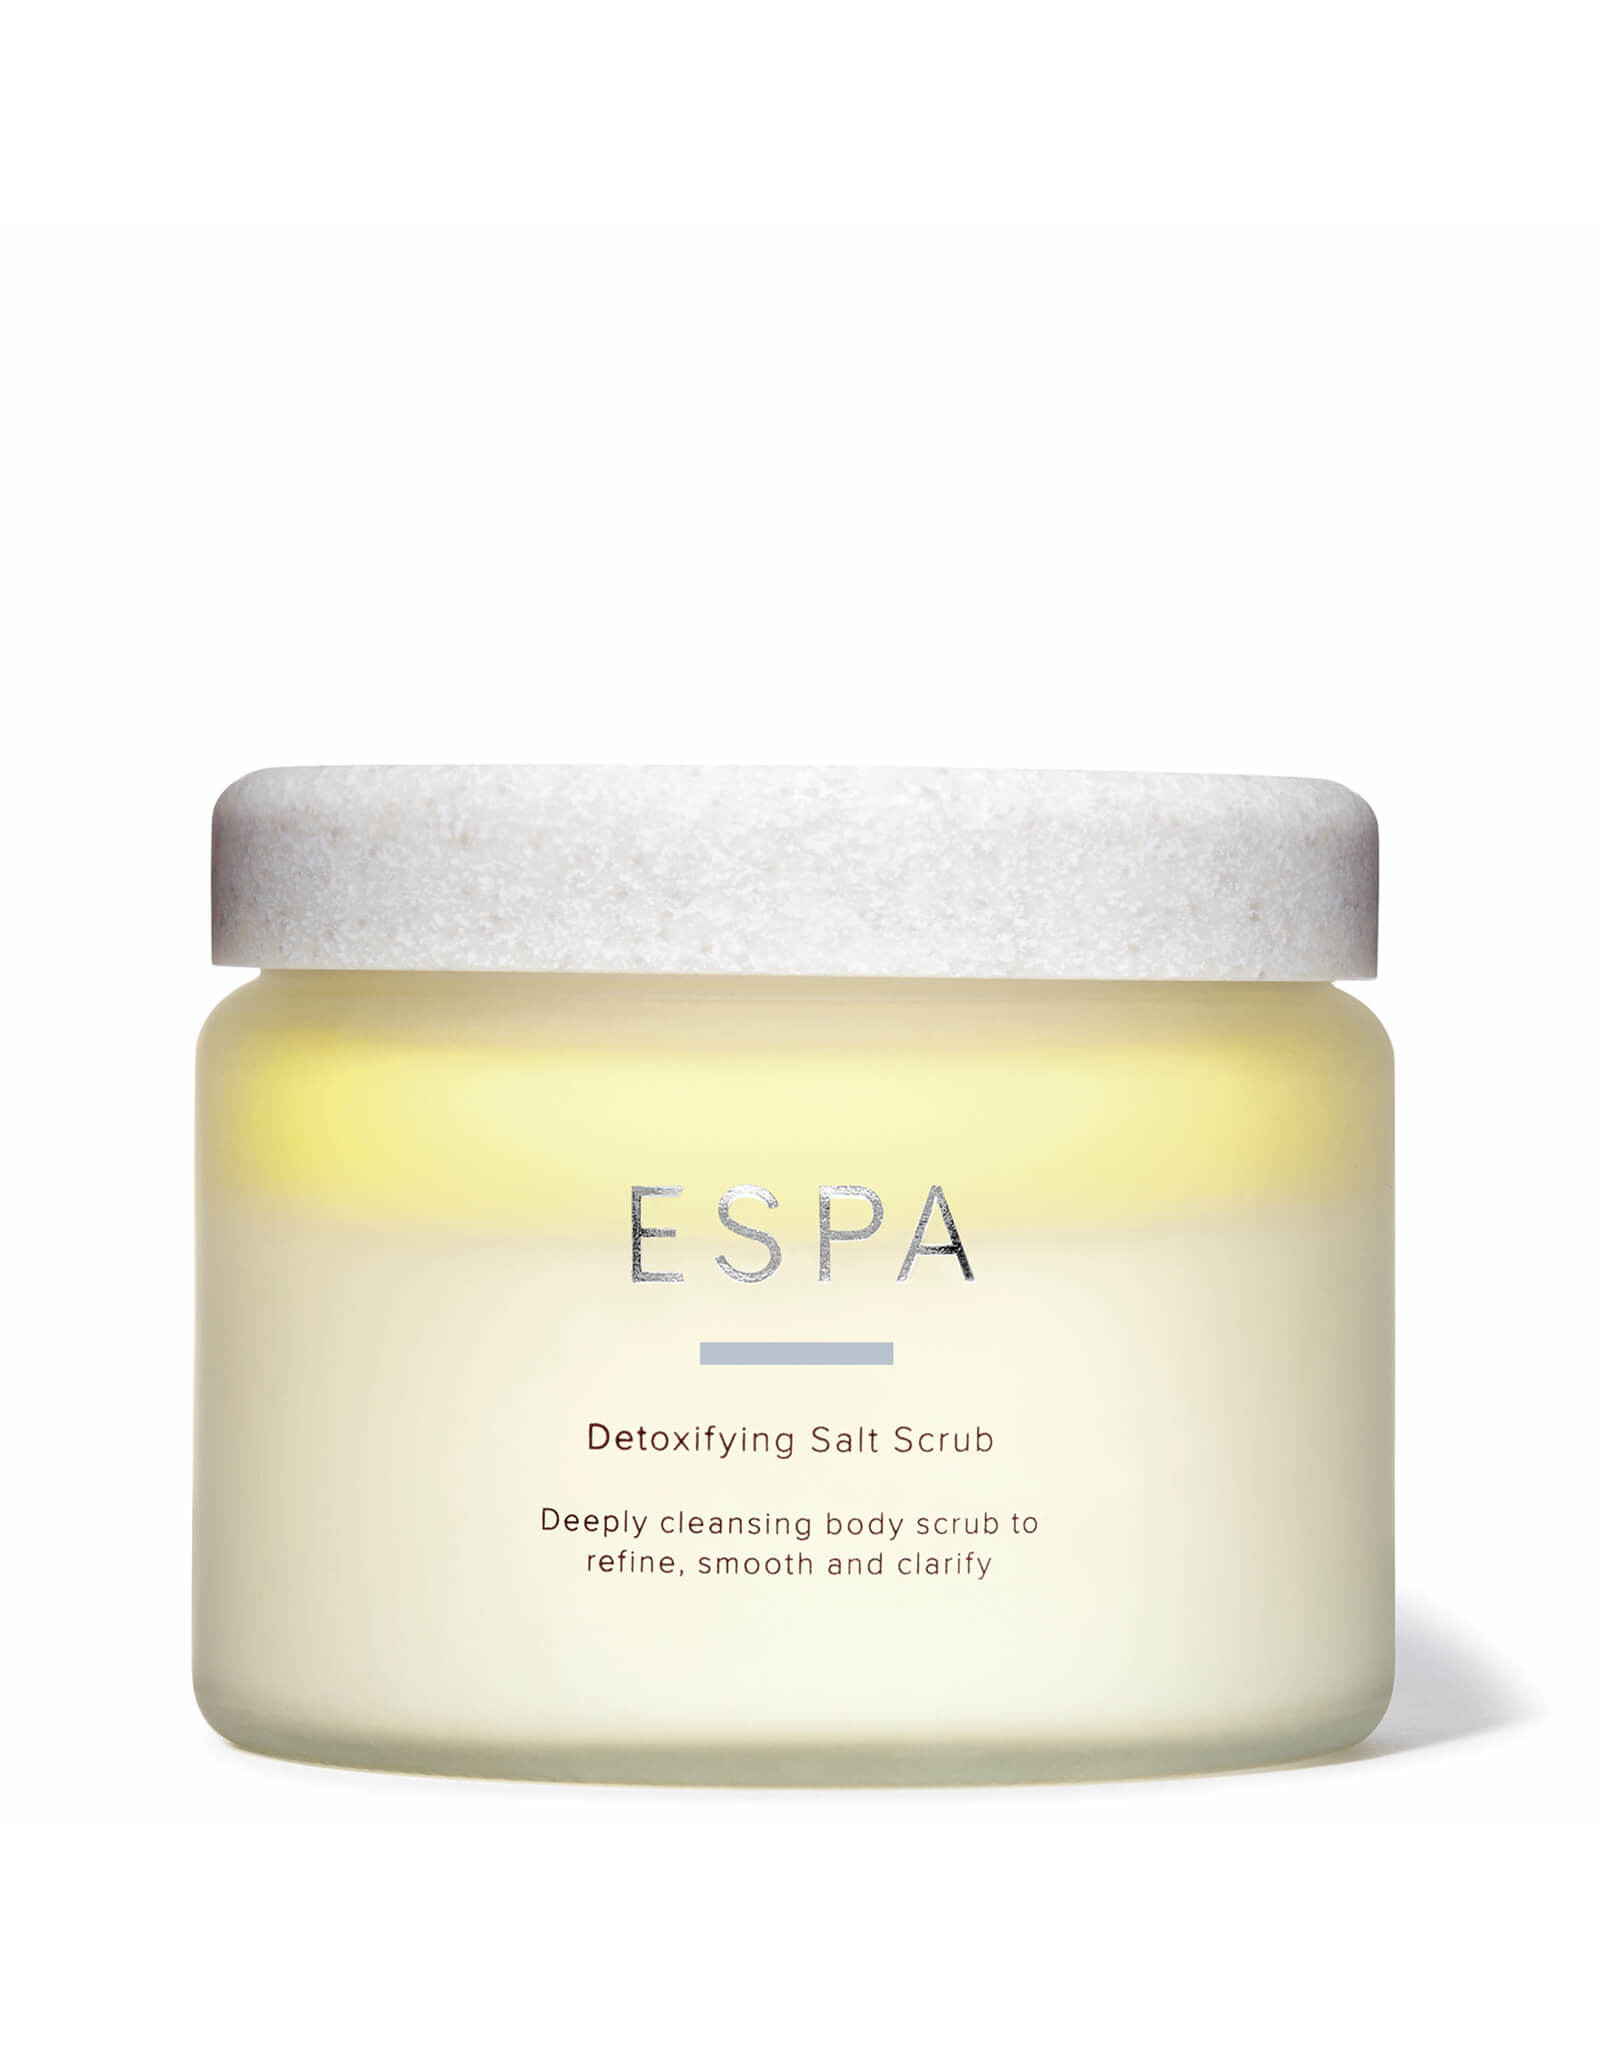 ESPA Detoxifying Salt Scrub, 700g